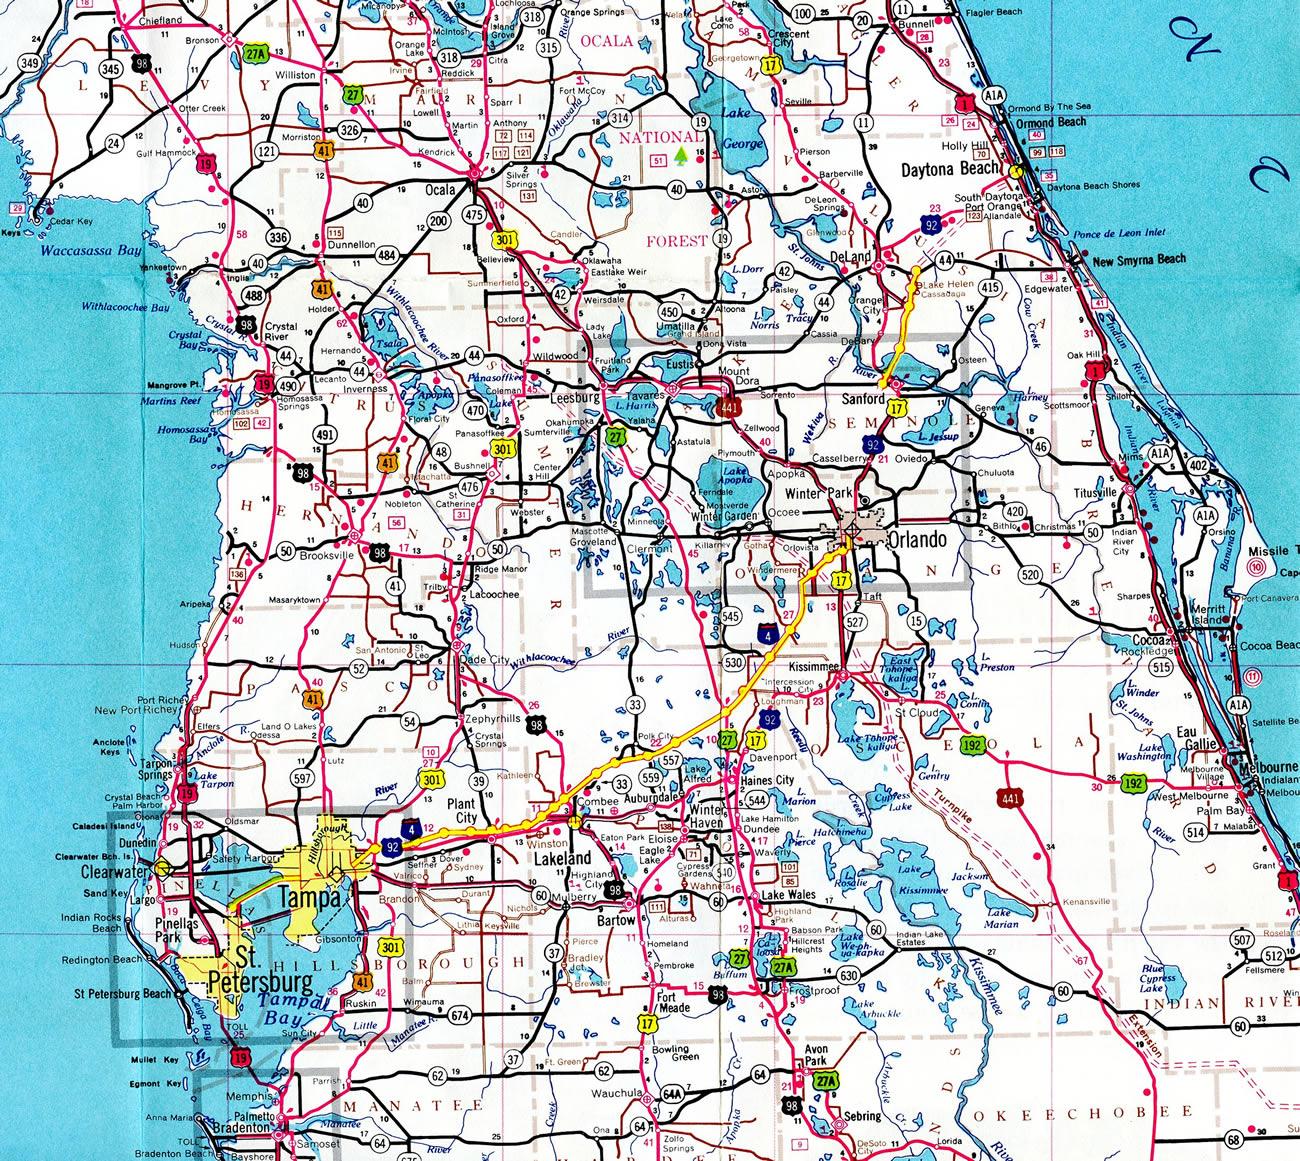 Florida Highway Map - Aishouzuo - Highway Map Of South Florida